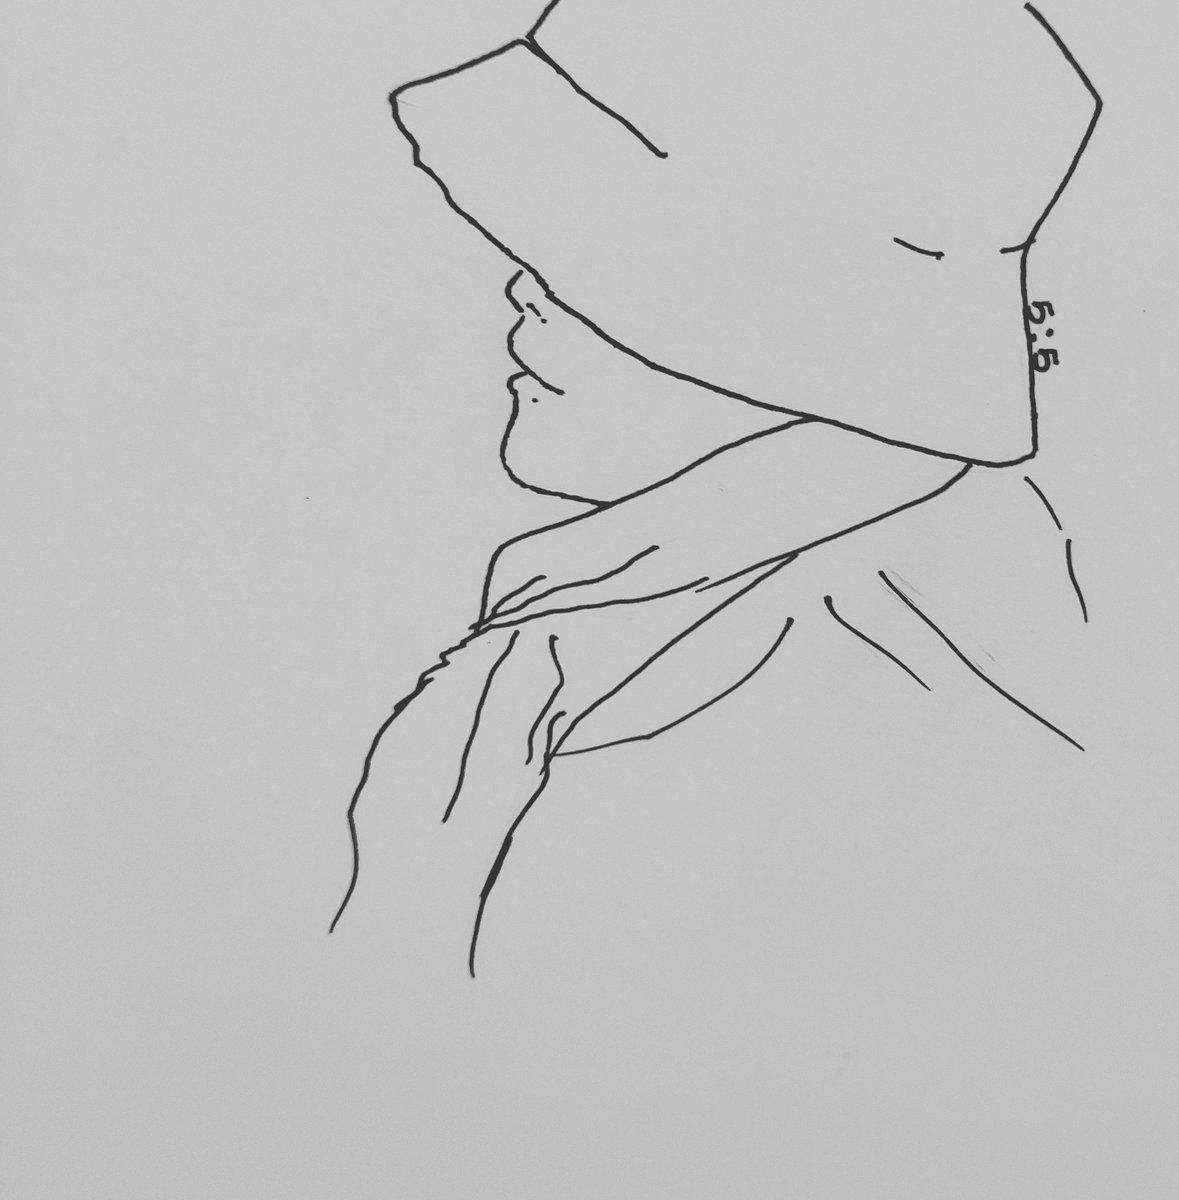 I was stuck in the rut... #longtimenosee #sketch #drawing #illusion #fanart #NamTaeHyun #남태현 #SouthClub #kpop